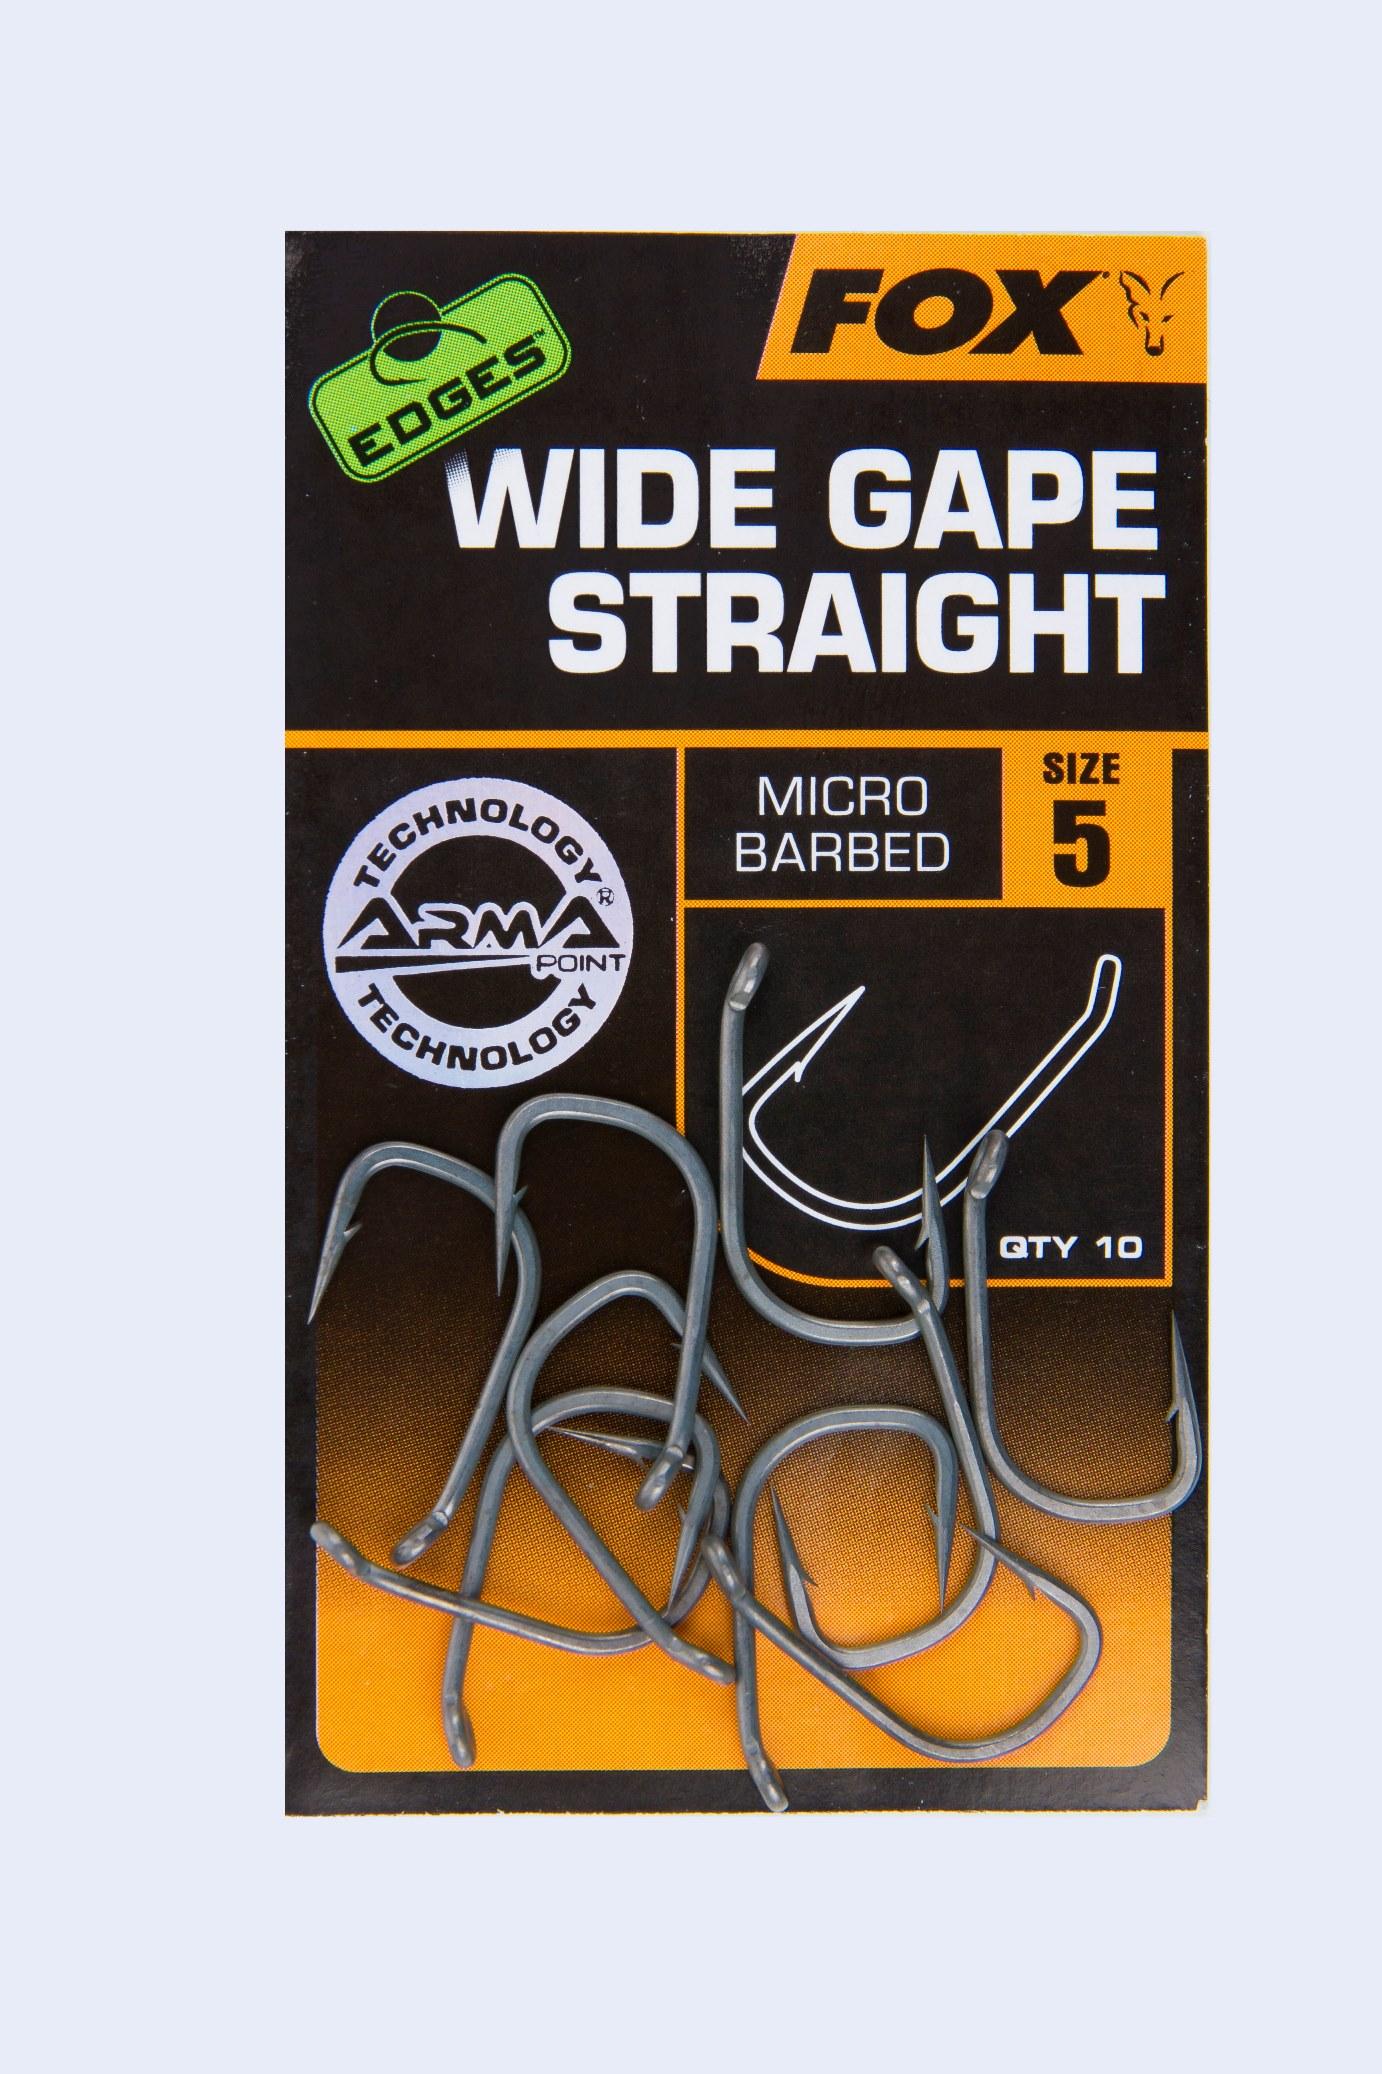 Fox-Edges-Hooks-Wide-Gape-Straight-Micro-Barbed-10-Haken-Gr-2-4-5-6-7-8-Arma